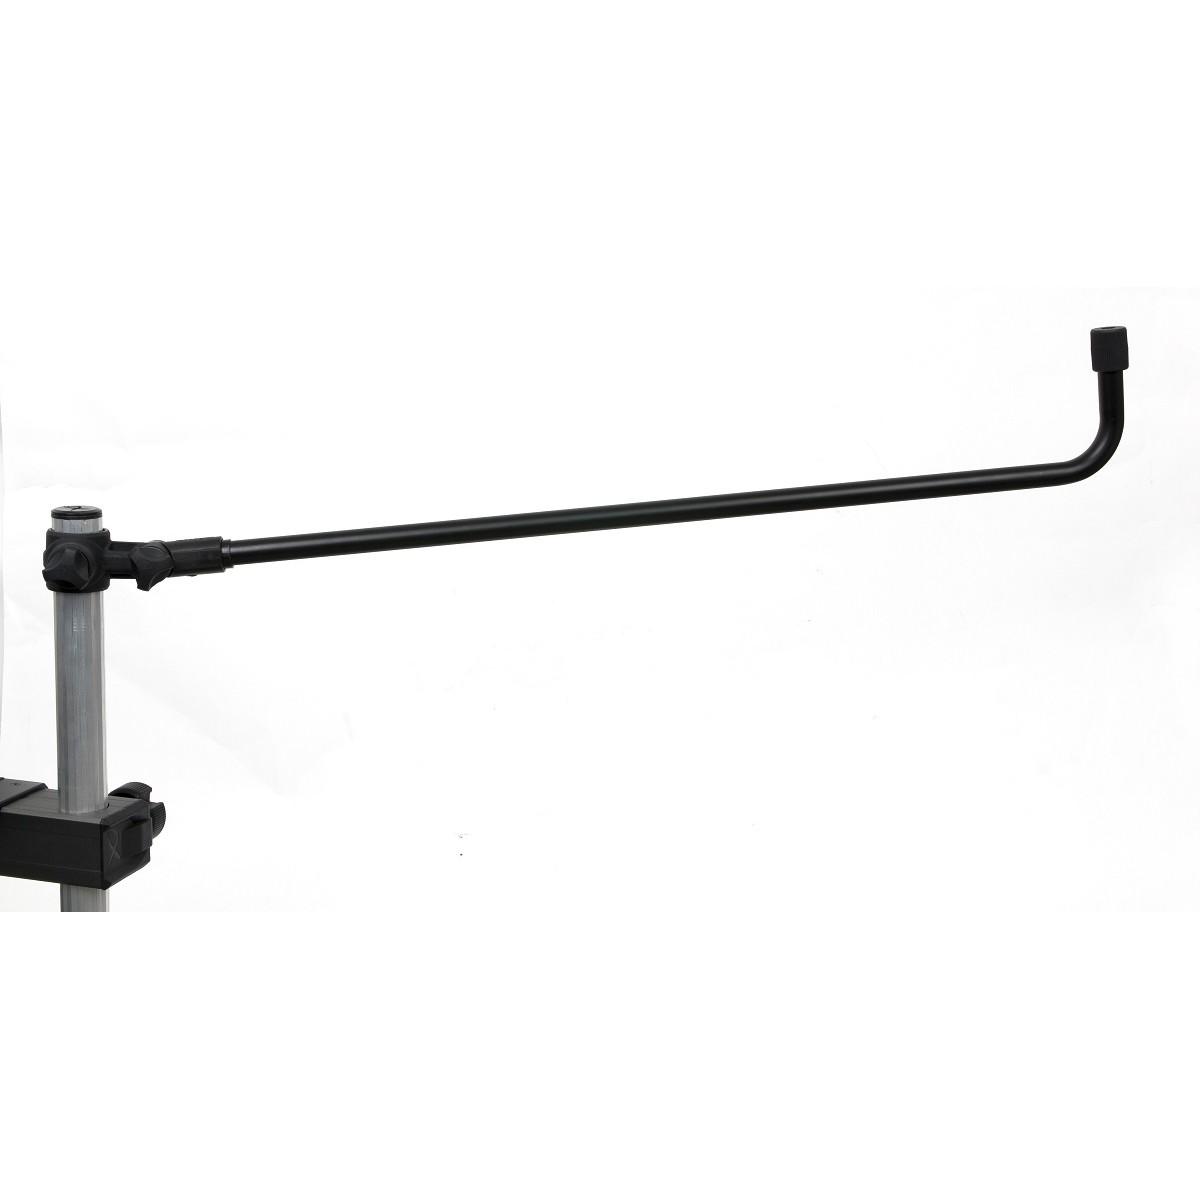 Прикачна за платформа Matrix 3D Feeder Arm - универсално рамо